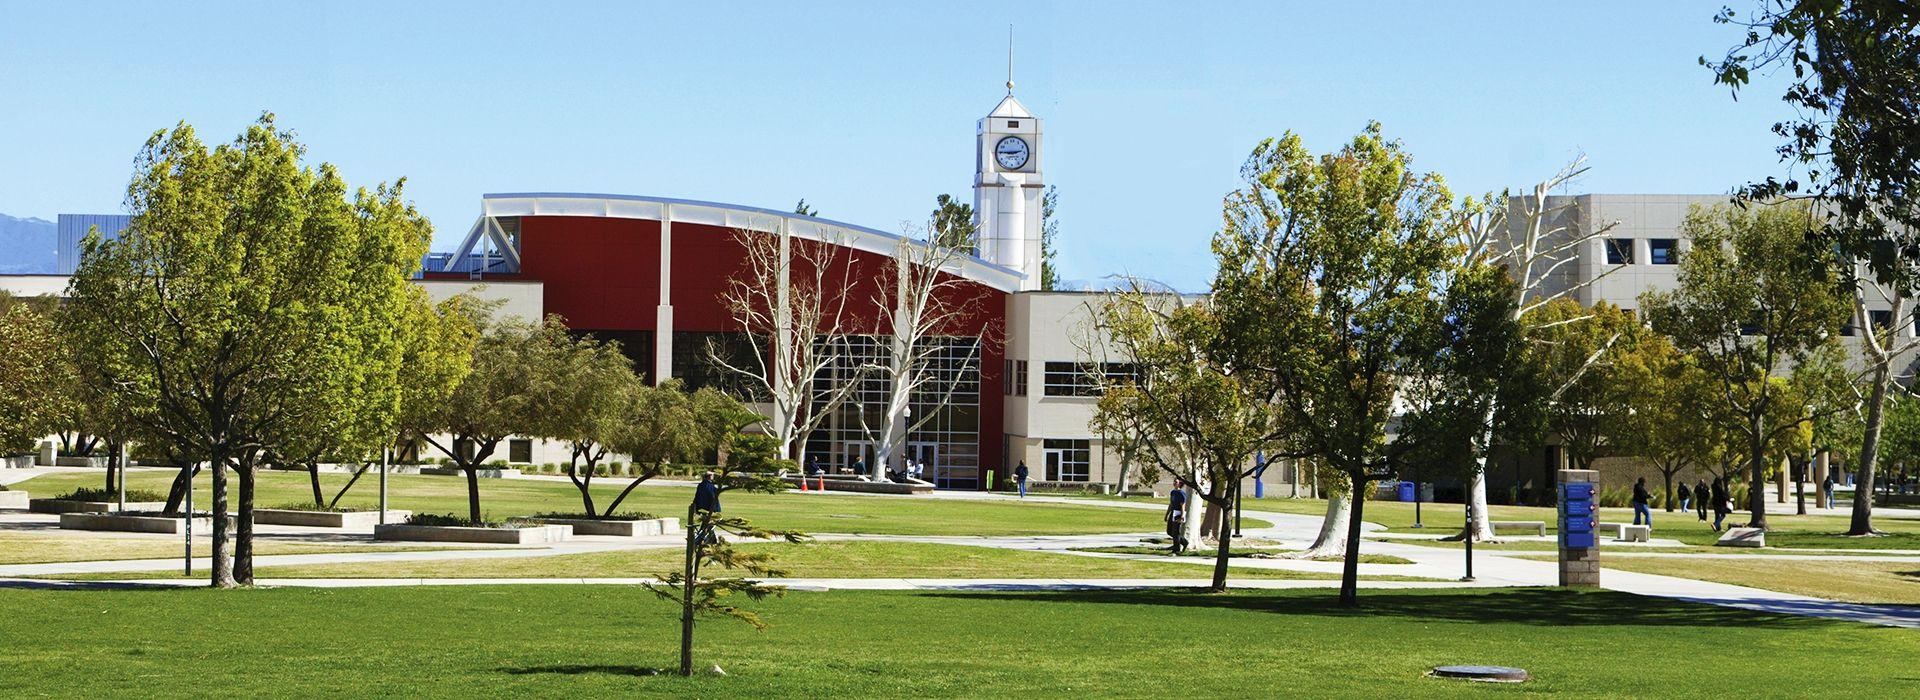 Cal State San Bernardino Receives 1 1 Million In Grants To Increase Bachelor S Degree Attainment Rates Csusb News Csusb